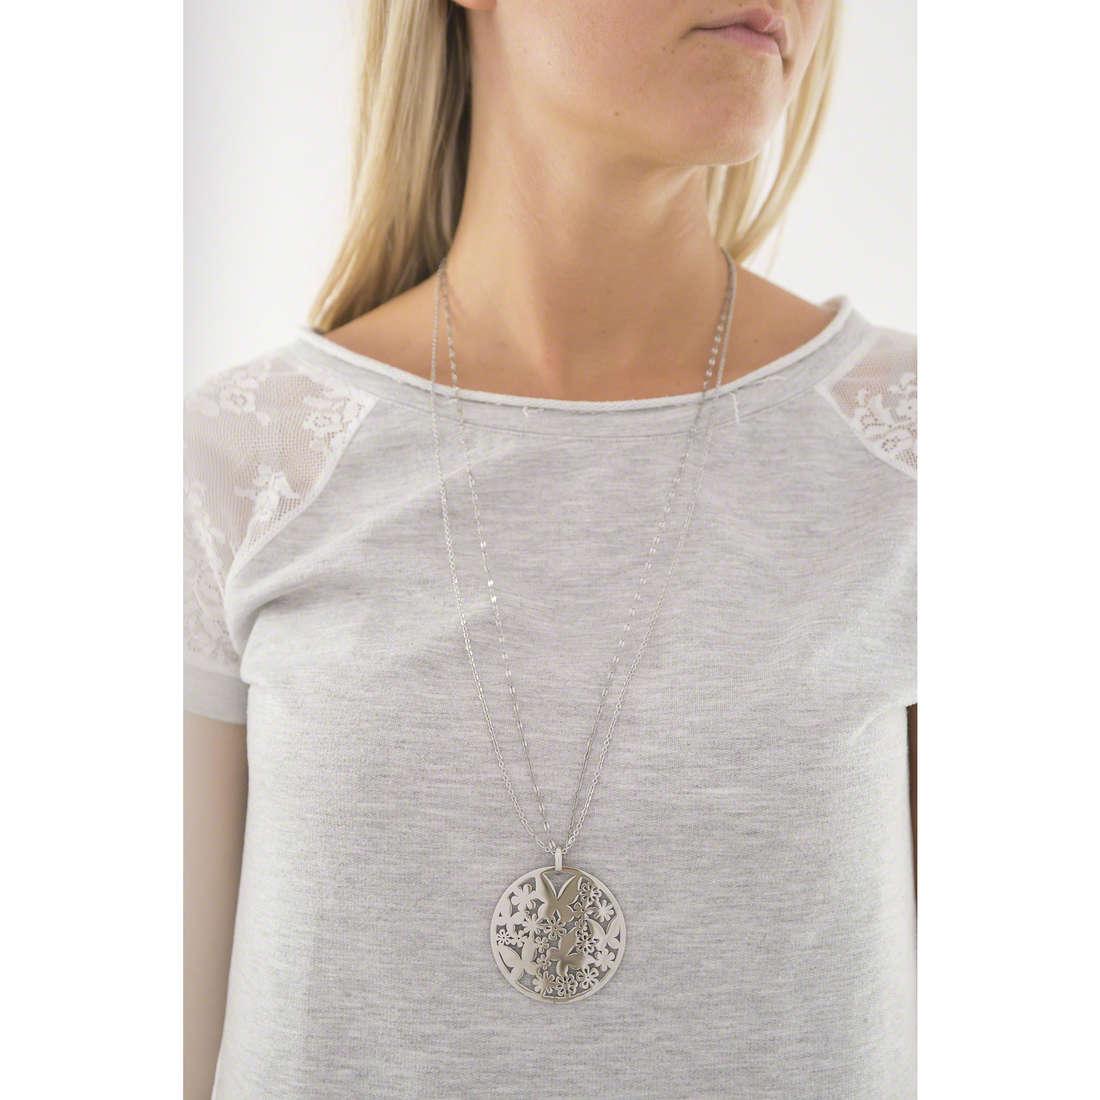 Sagapò colliers Flower femme SFL02 indosso